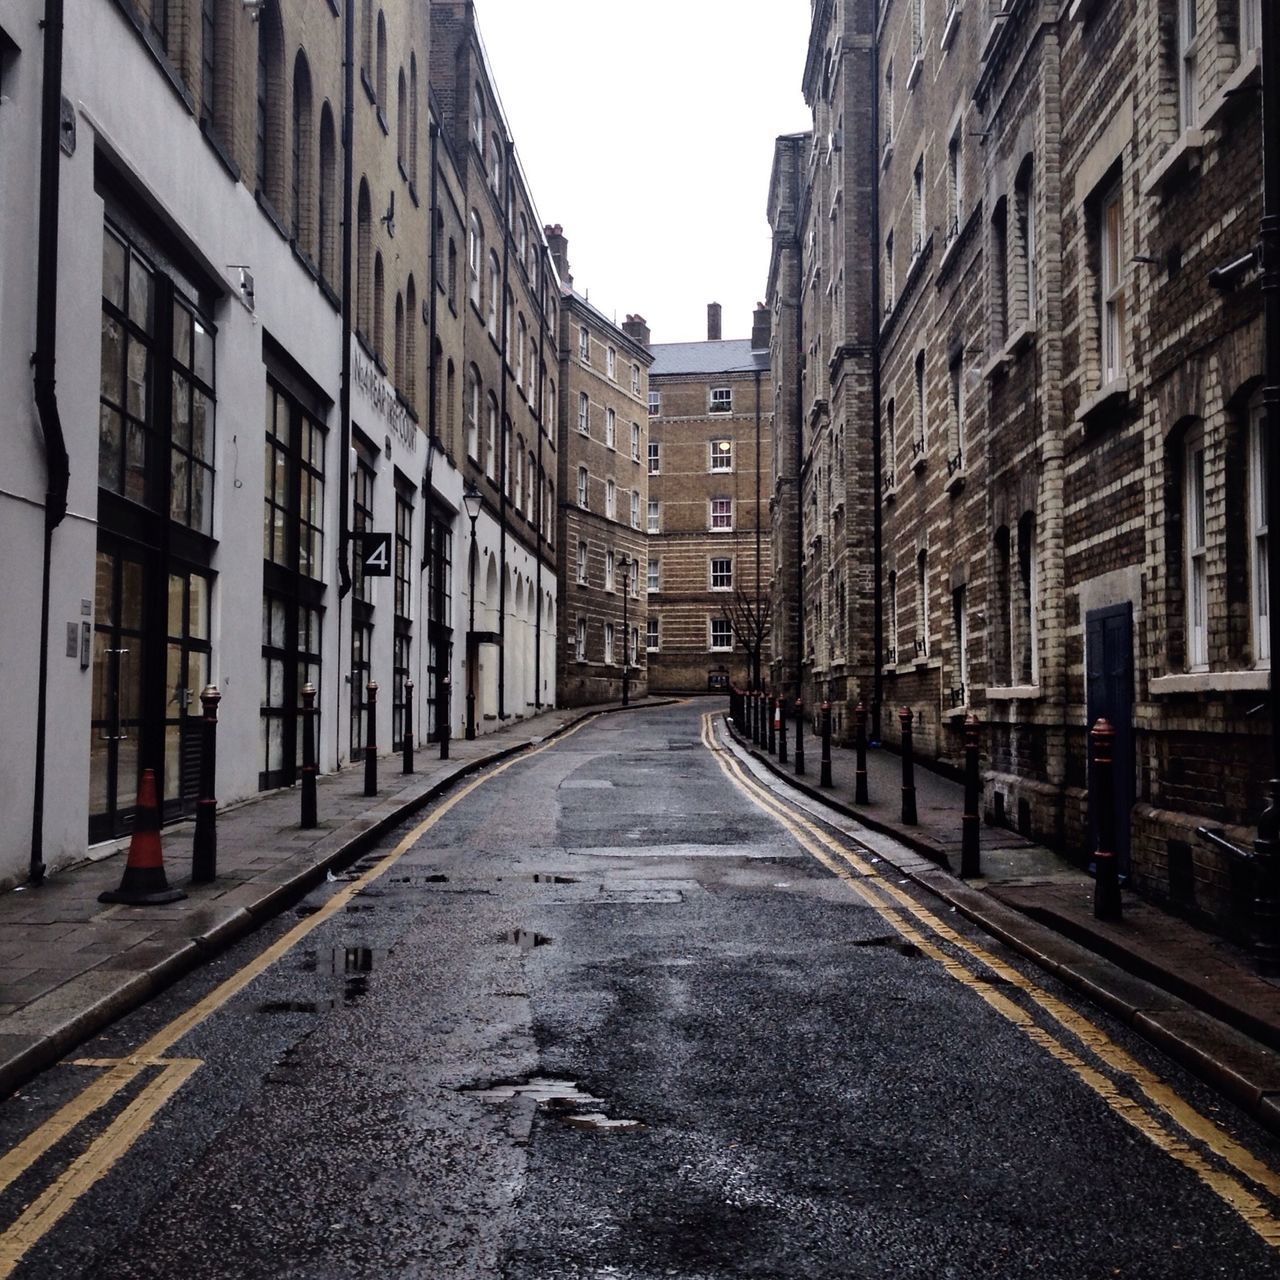 View of empty street